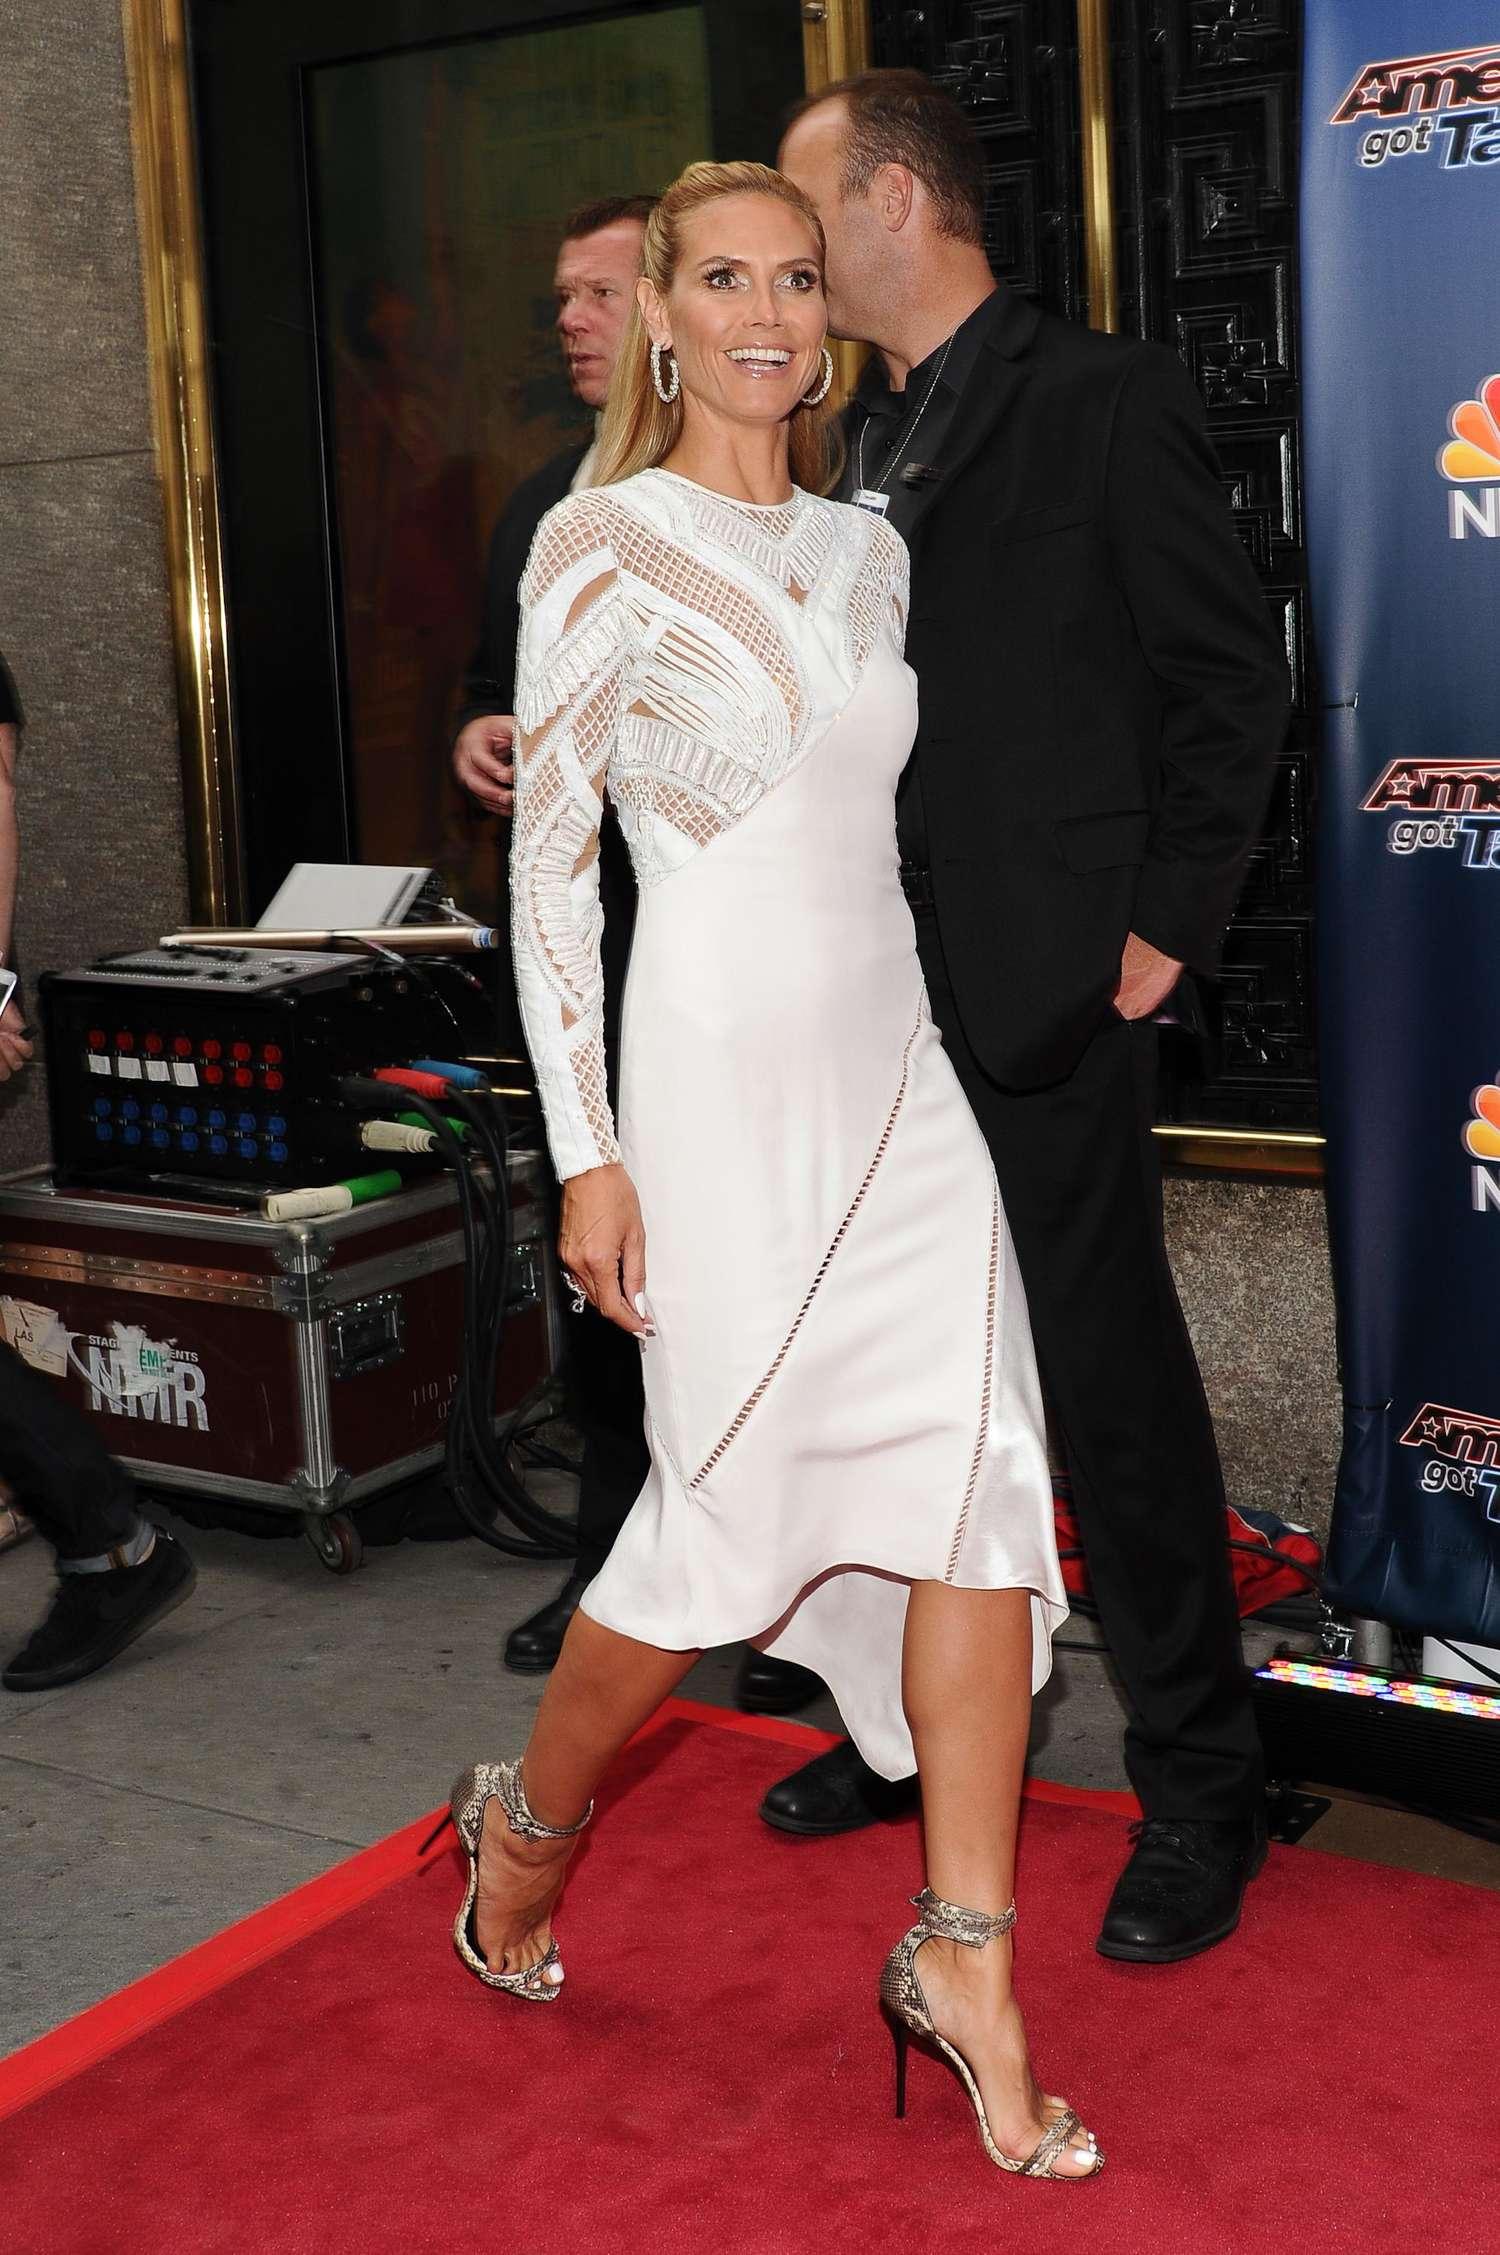 Heidi Klum 2014 : Heidi Klum: Americas Got Talent Season 9 Event -21